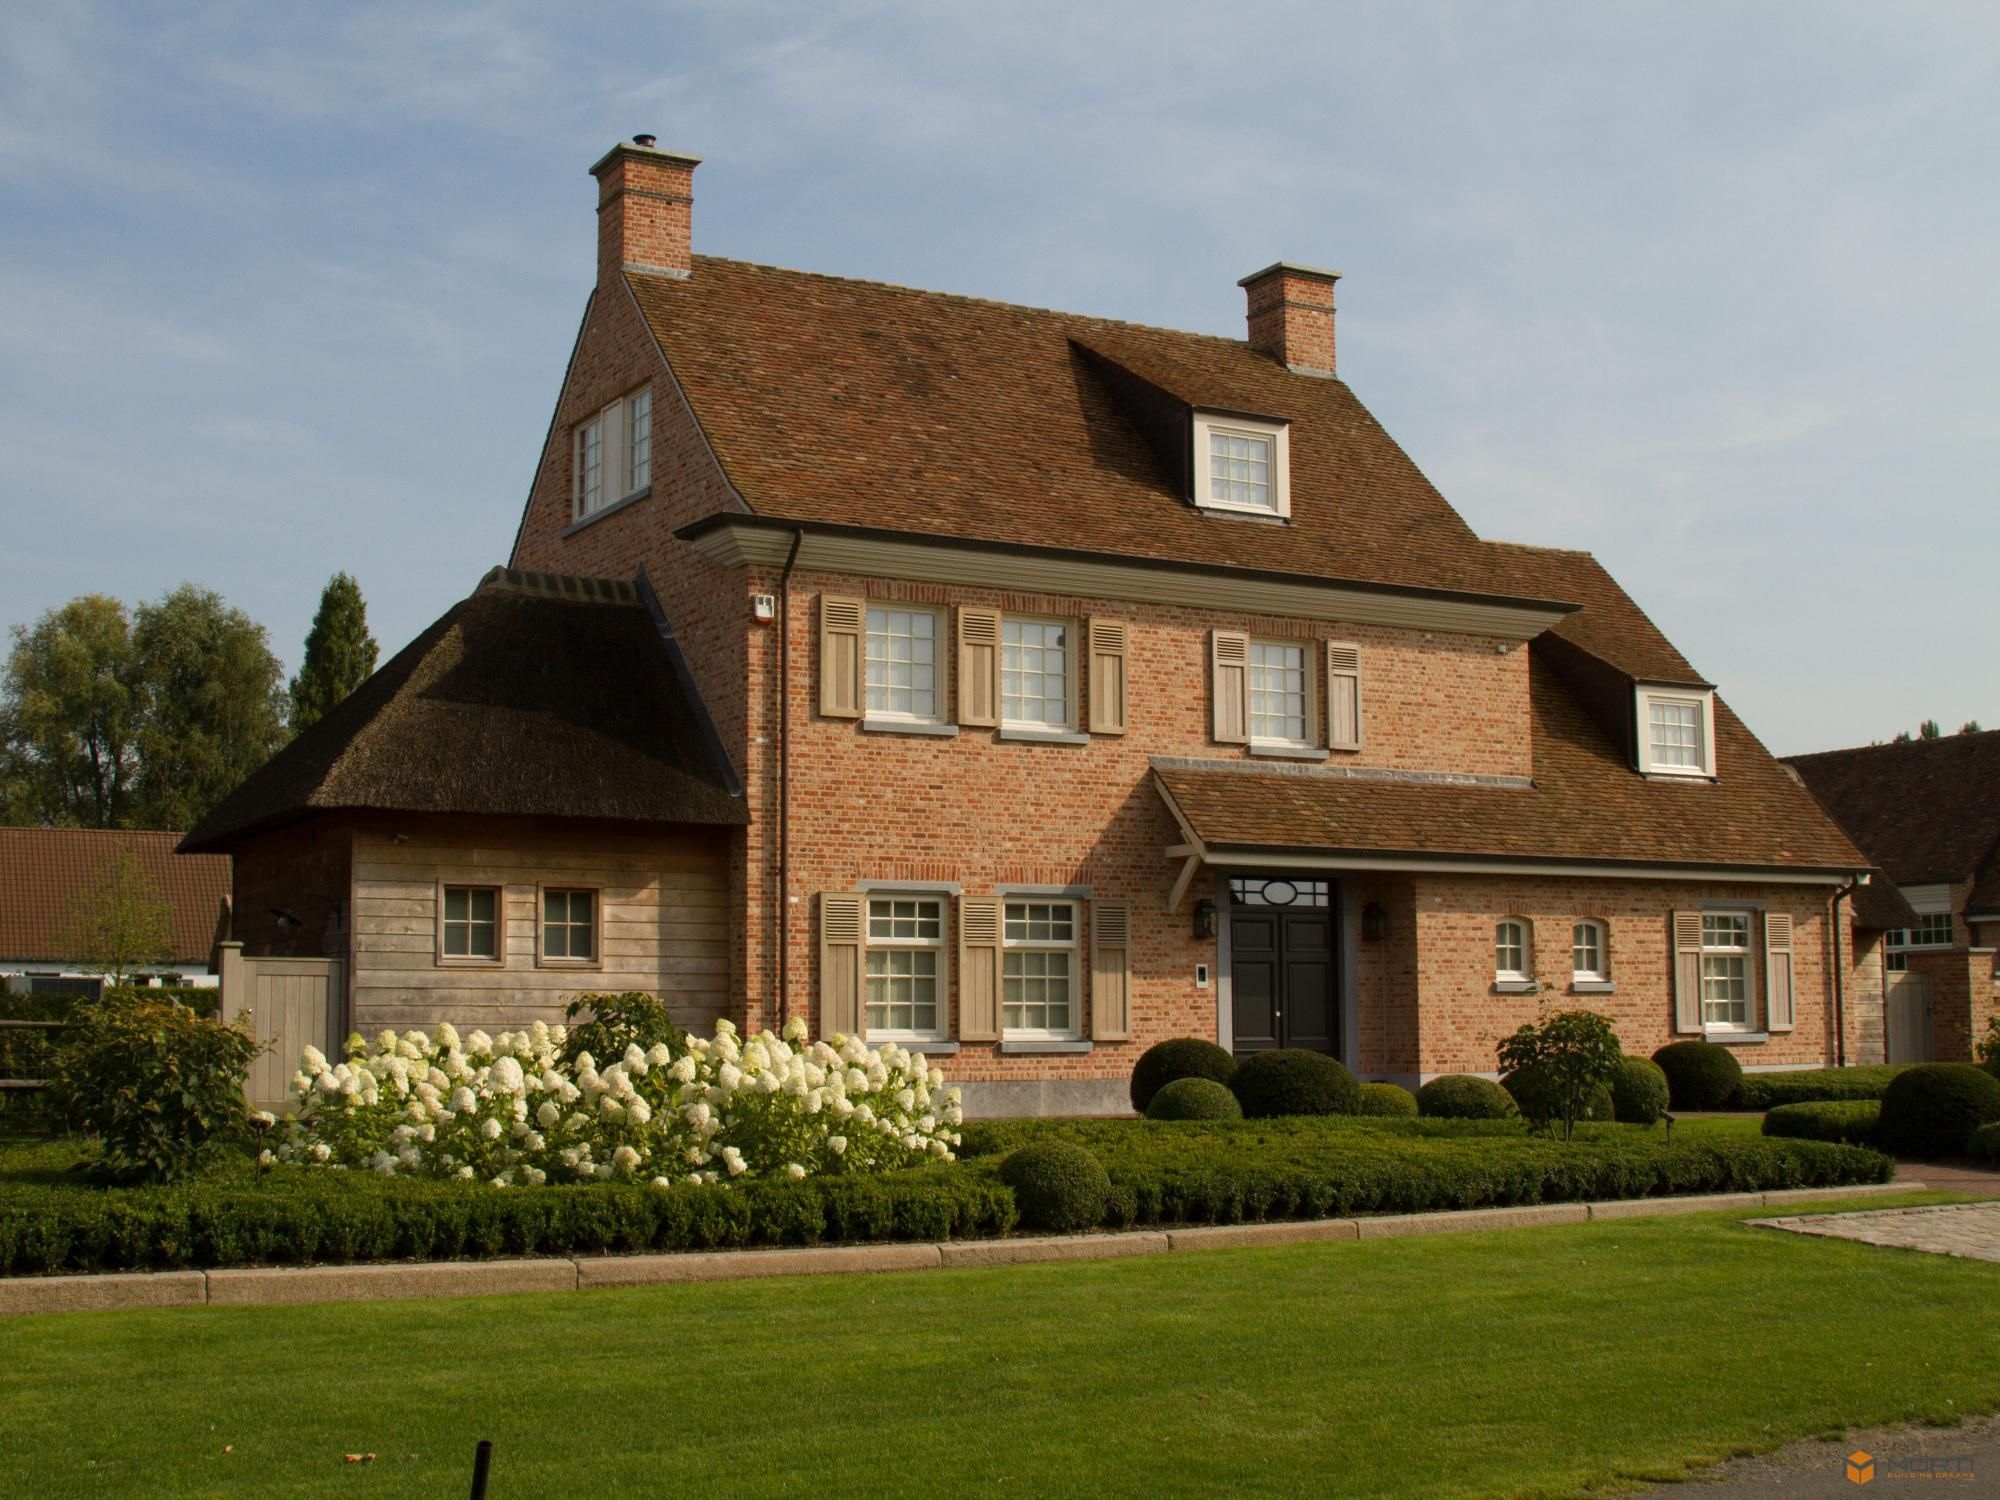 Woningbouw in klassieke stijl stone brick and stucco homes in